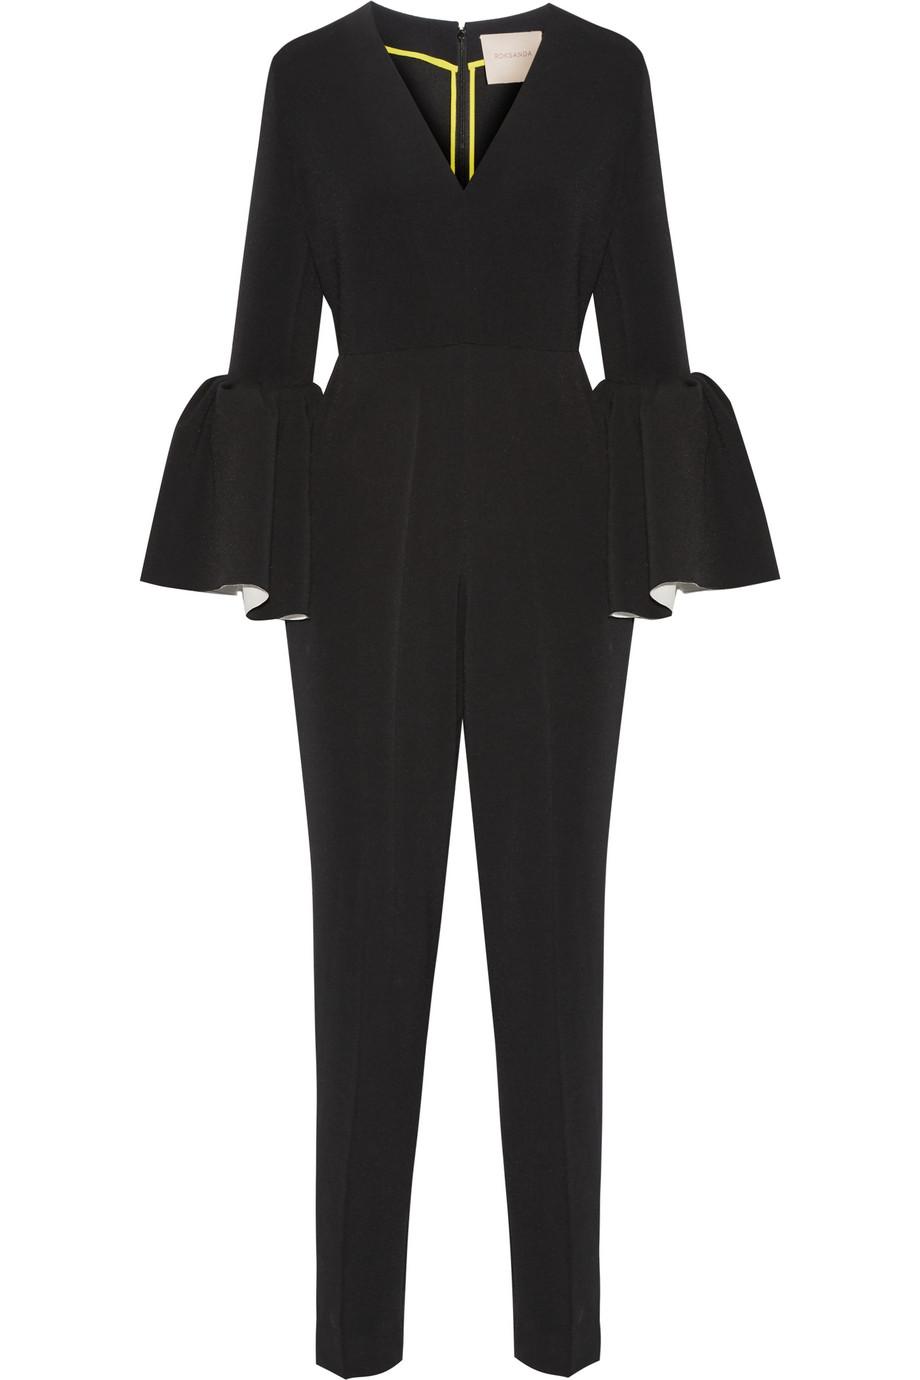 Roksanda Margot Crepe Jumpsuit, Black, Women's, Size: 8